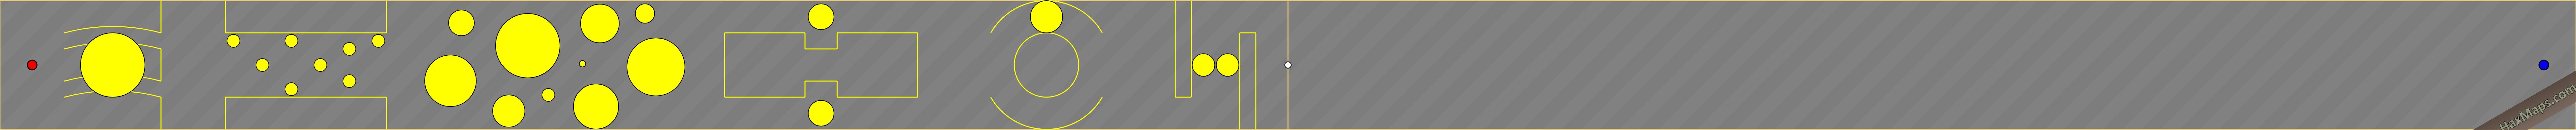 hax ball maps | Yellow-1